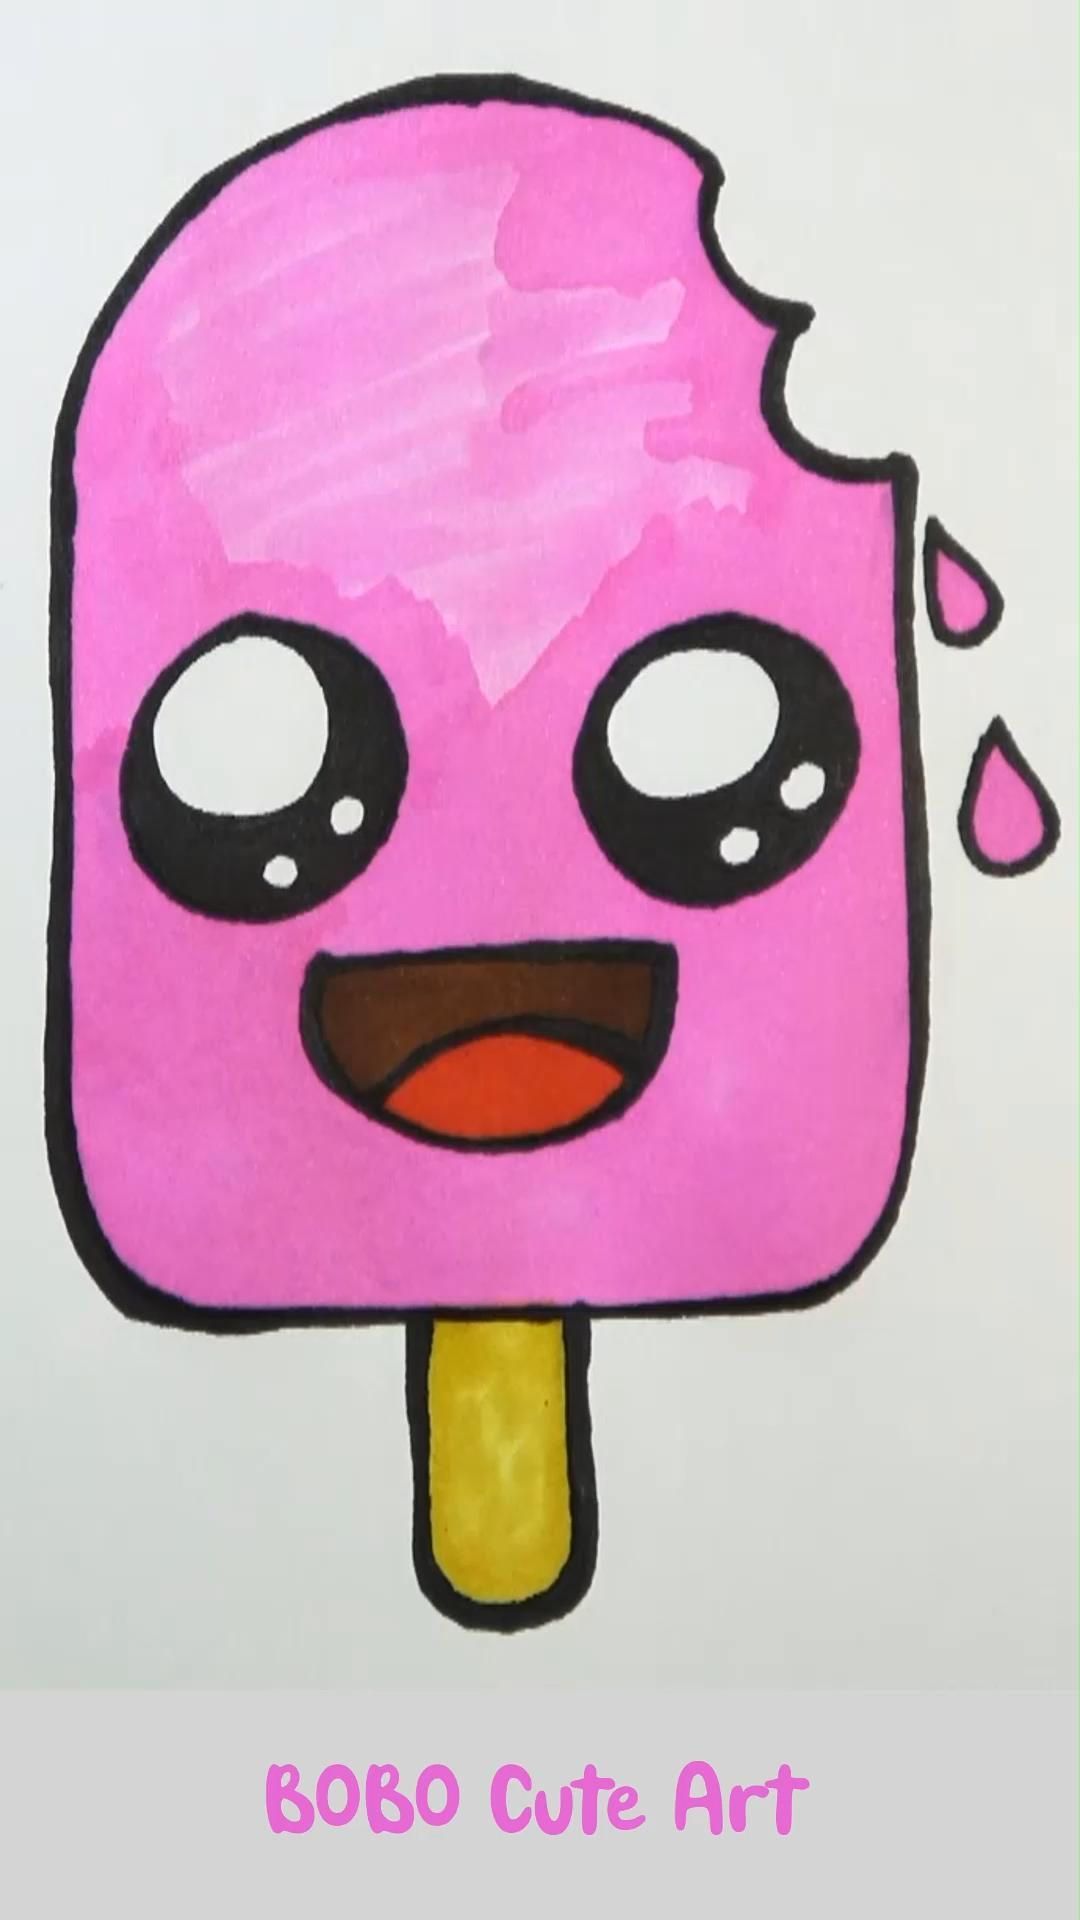 How to Draw Cute Ice Cream | BOBO Cute Art #cutedr